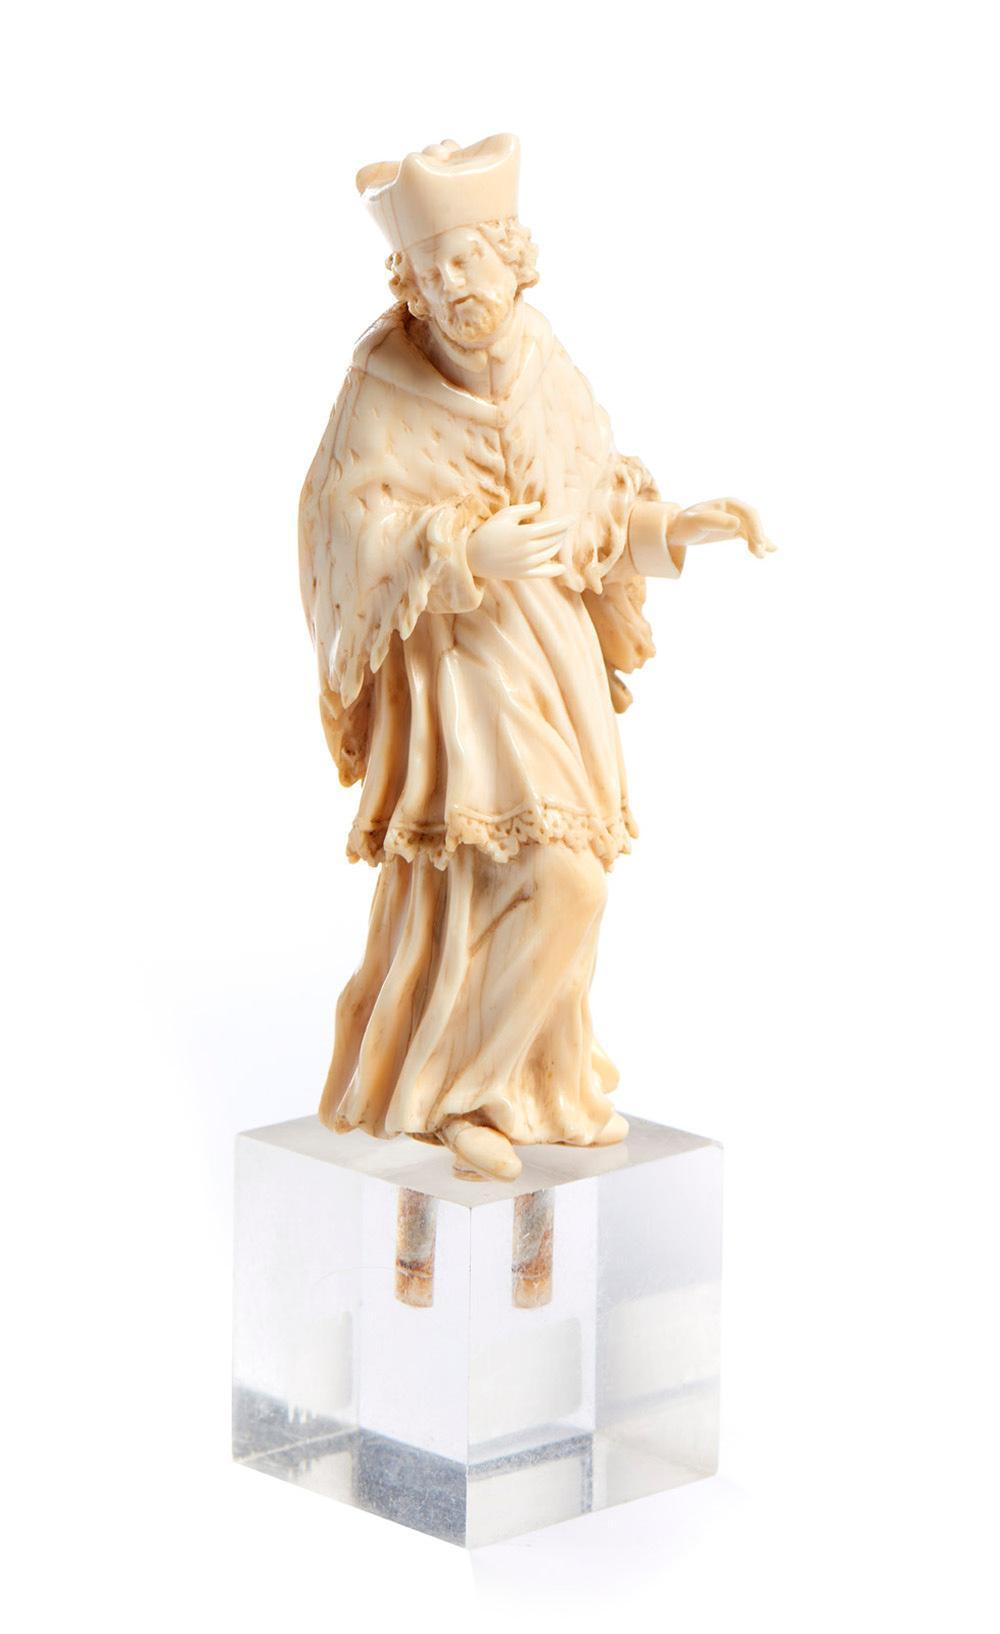 Sto Inácio de Loyola, Esc. séc. XVIII, marfim